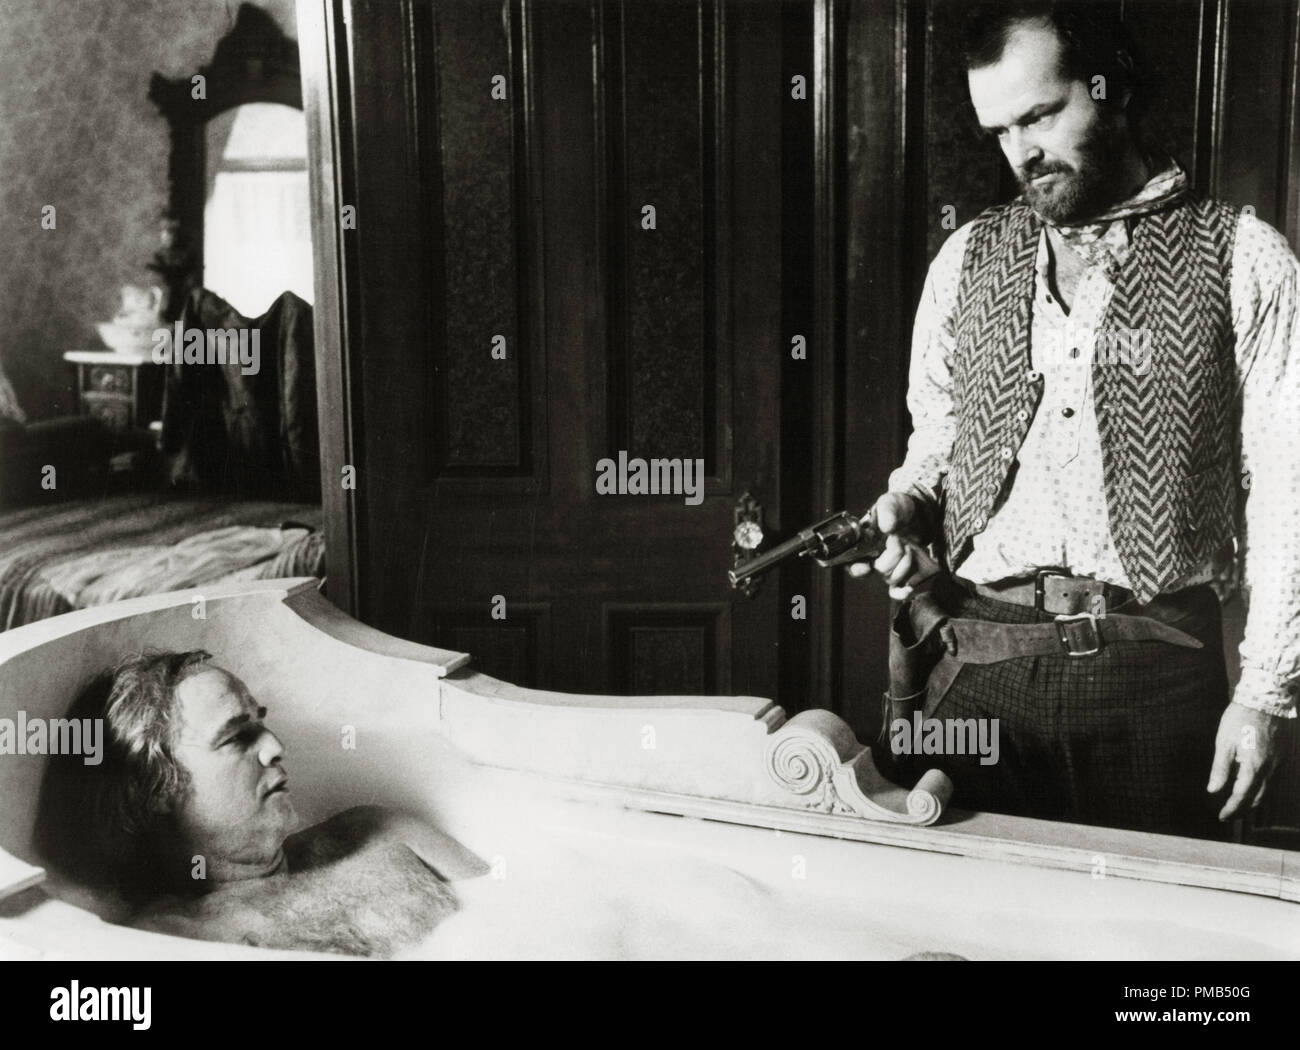 Marlon Brando and Jack Nicholson 'The Missouri Breaks' (1976) United Artists  File Reference # 33371_481THA - Stock Image